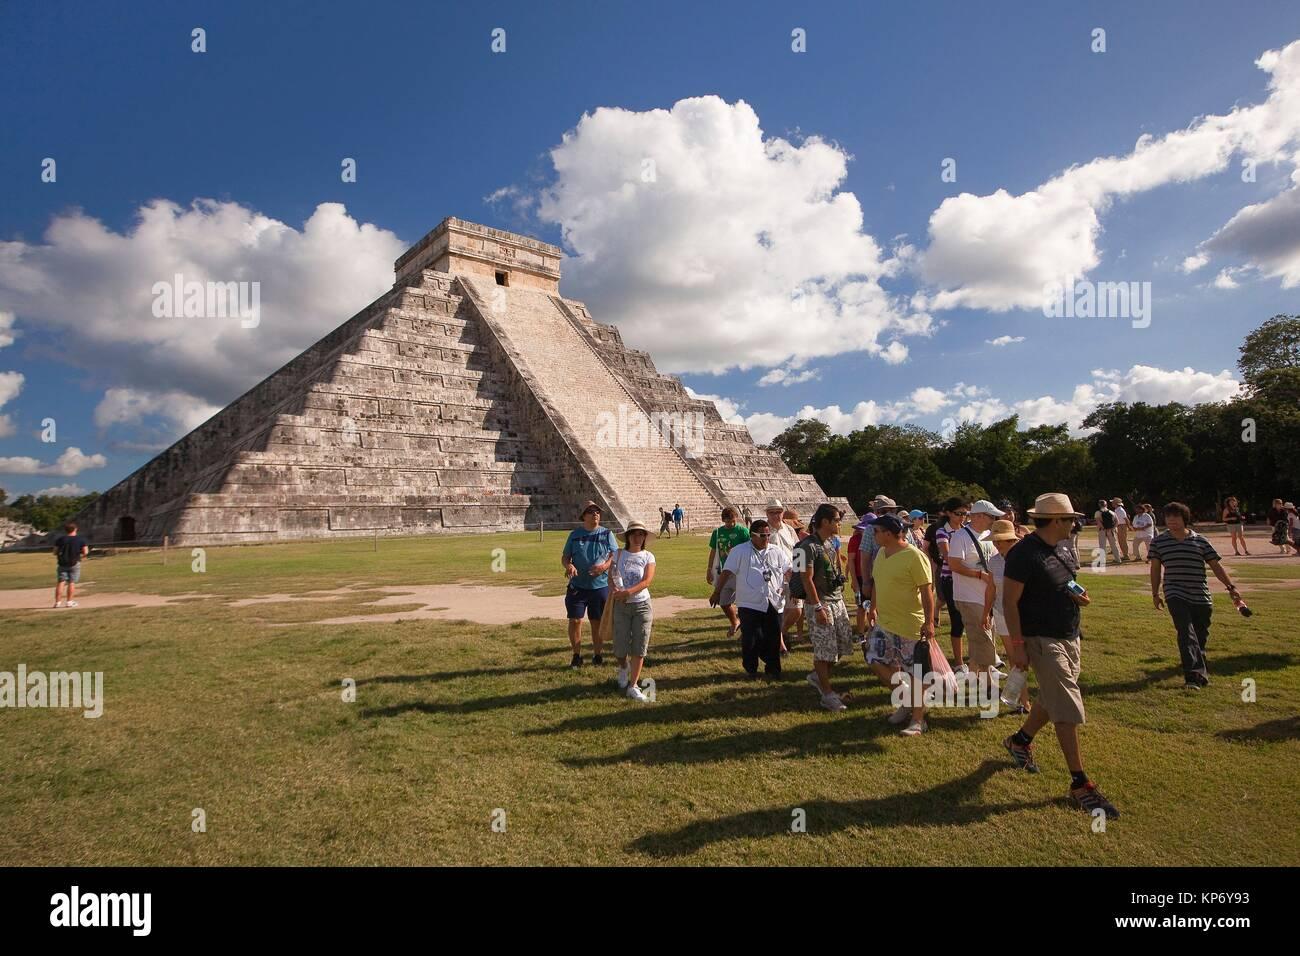 Tourist walking around the Pyramid of Kukulcan-El Castillo, Maya Archeological Site, Chichen Itza, Yucatan Province, - Stock Image